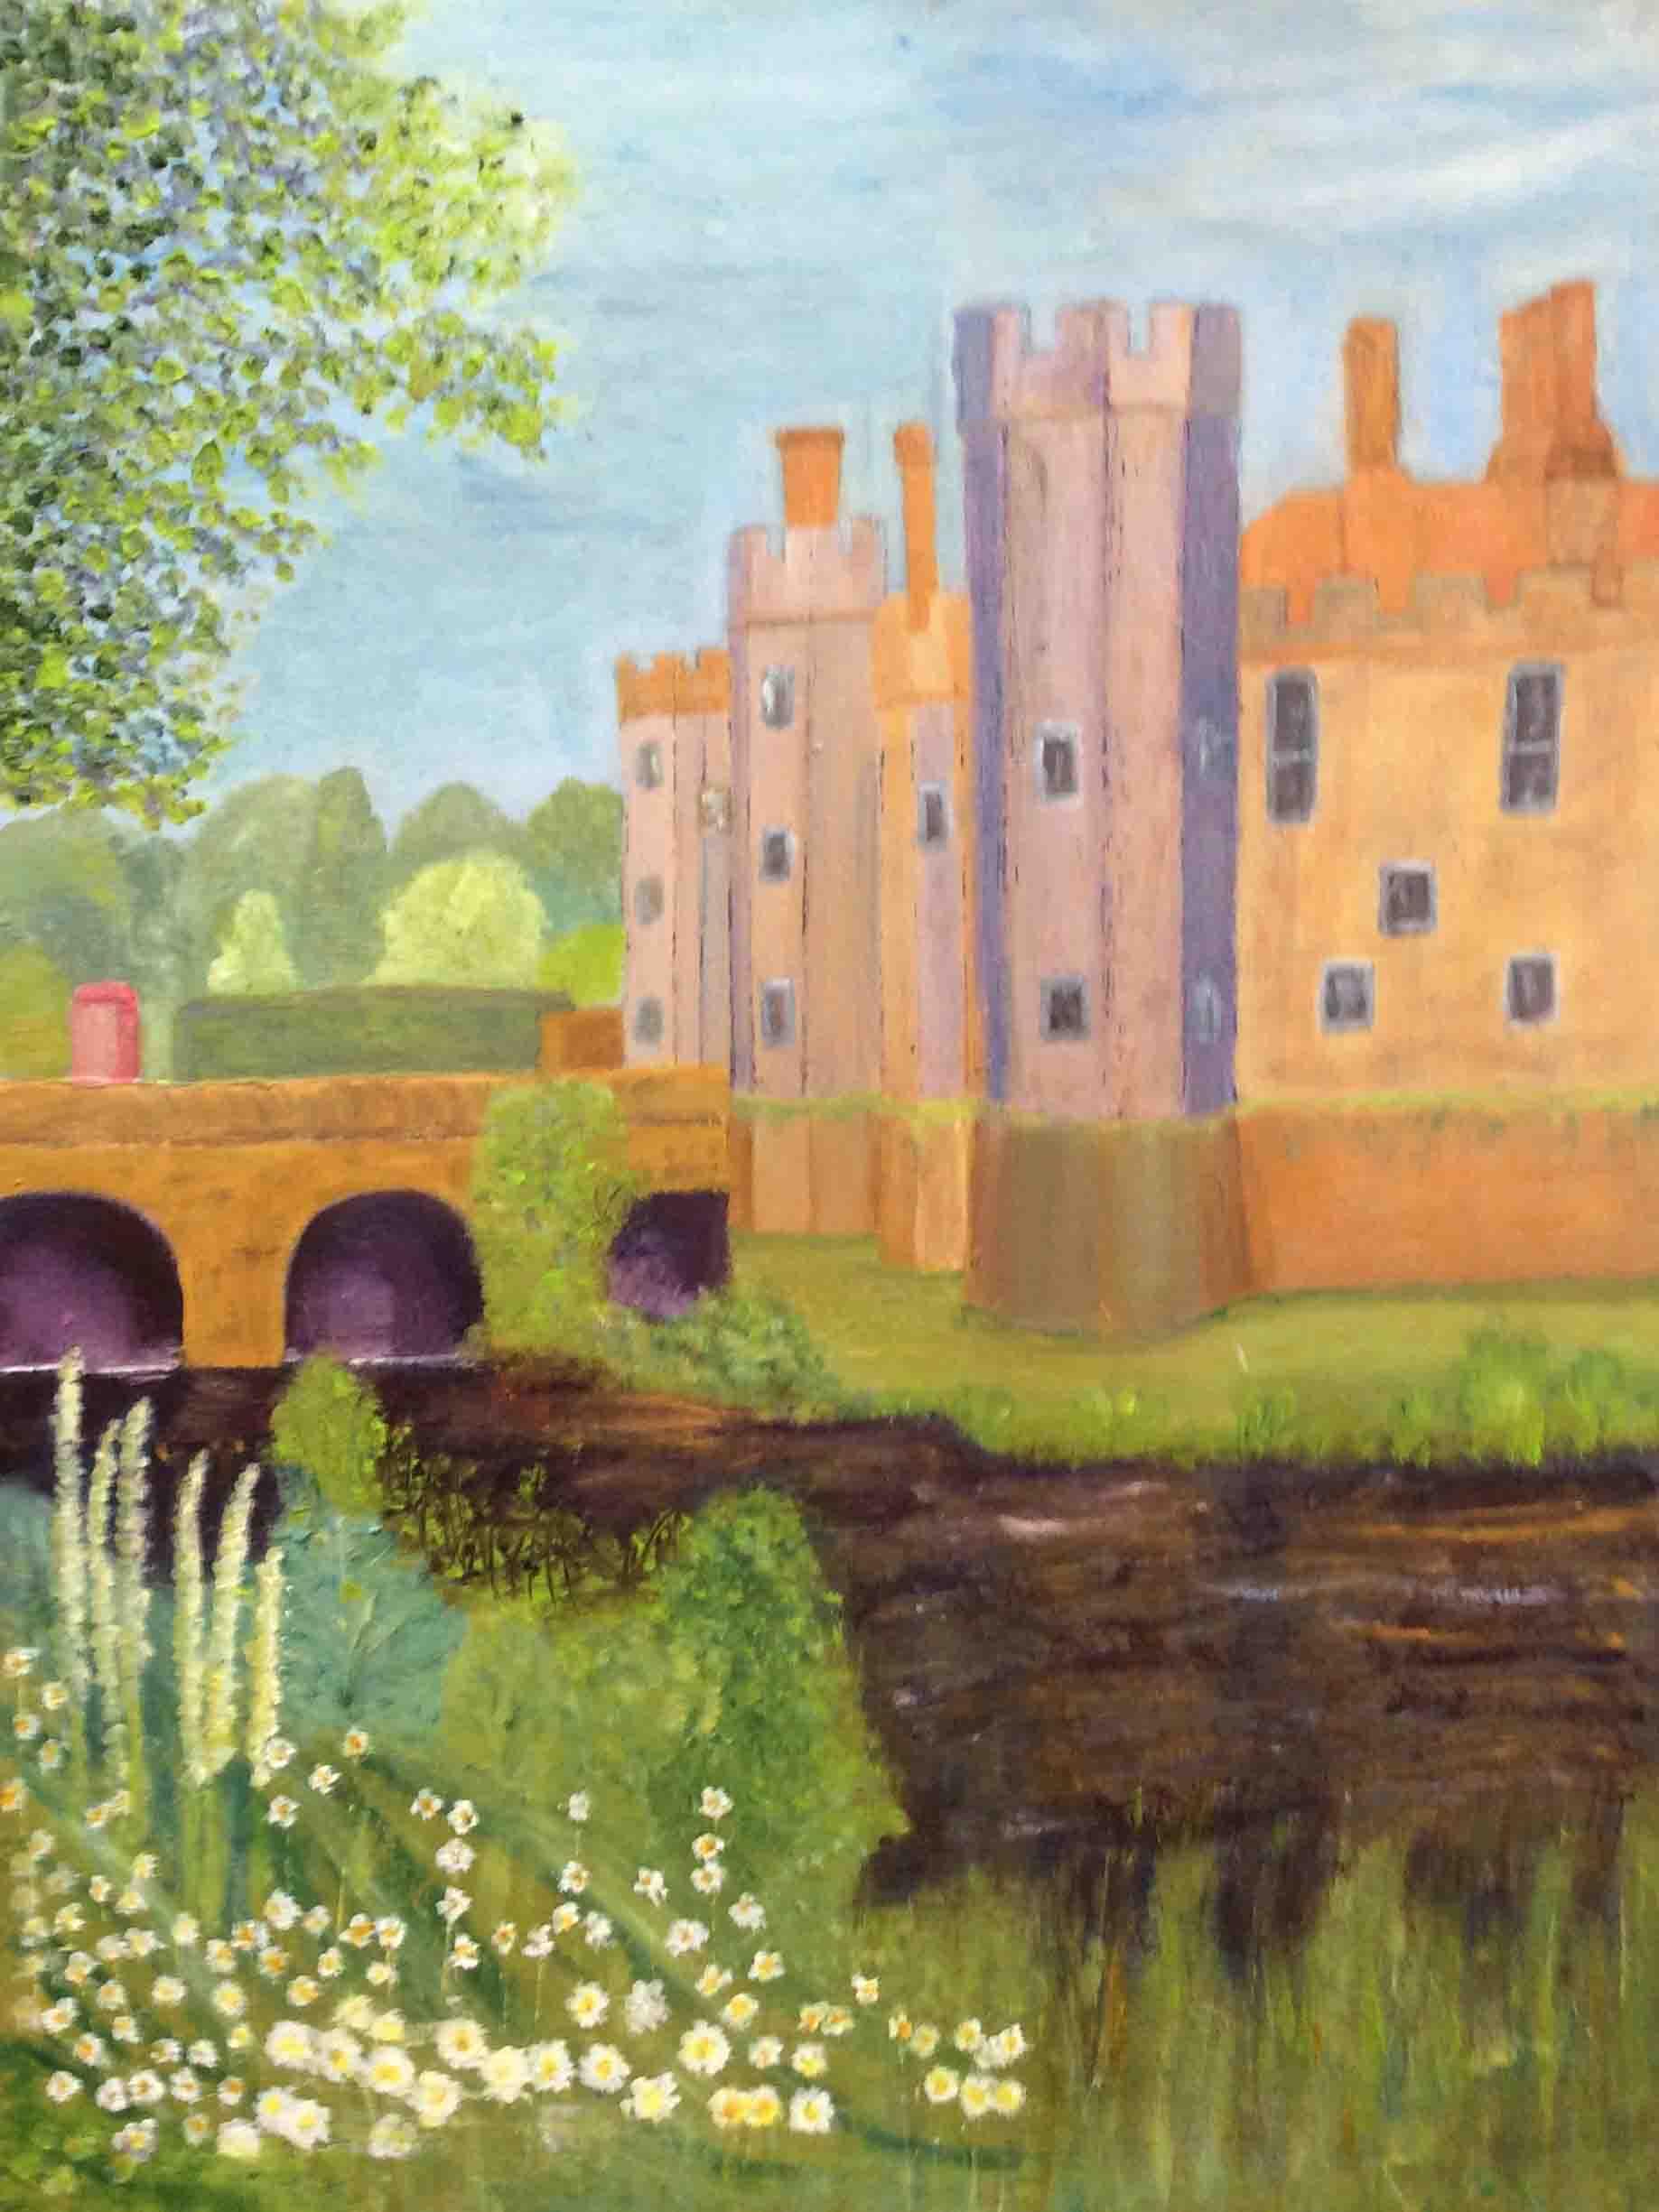 crit_maureenjones_Herstmonceux Castle